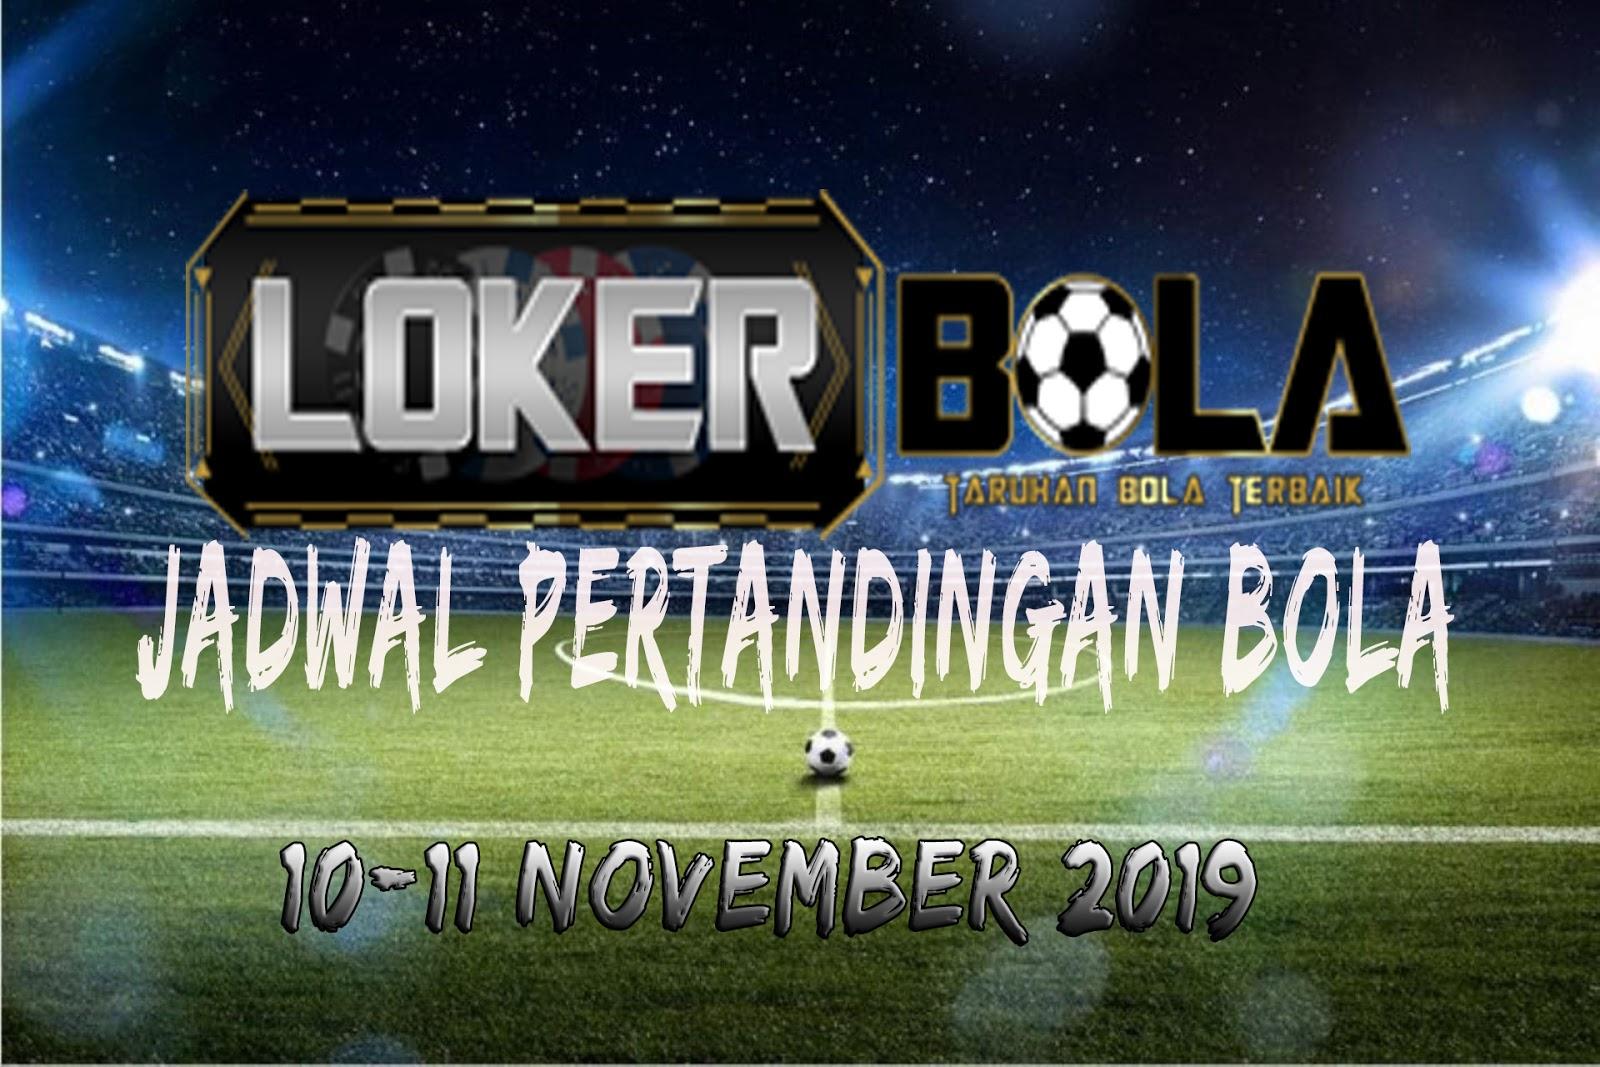 JADWAL PERTANDINGAN BOLA 10 – 11 NOVEMBER 2019